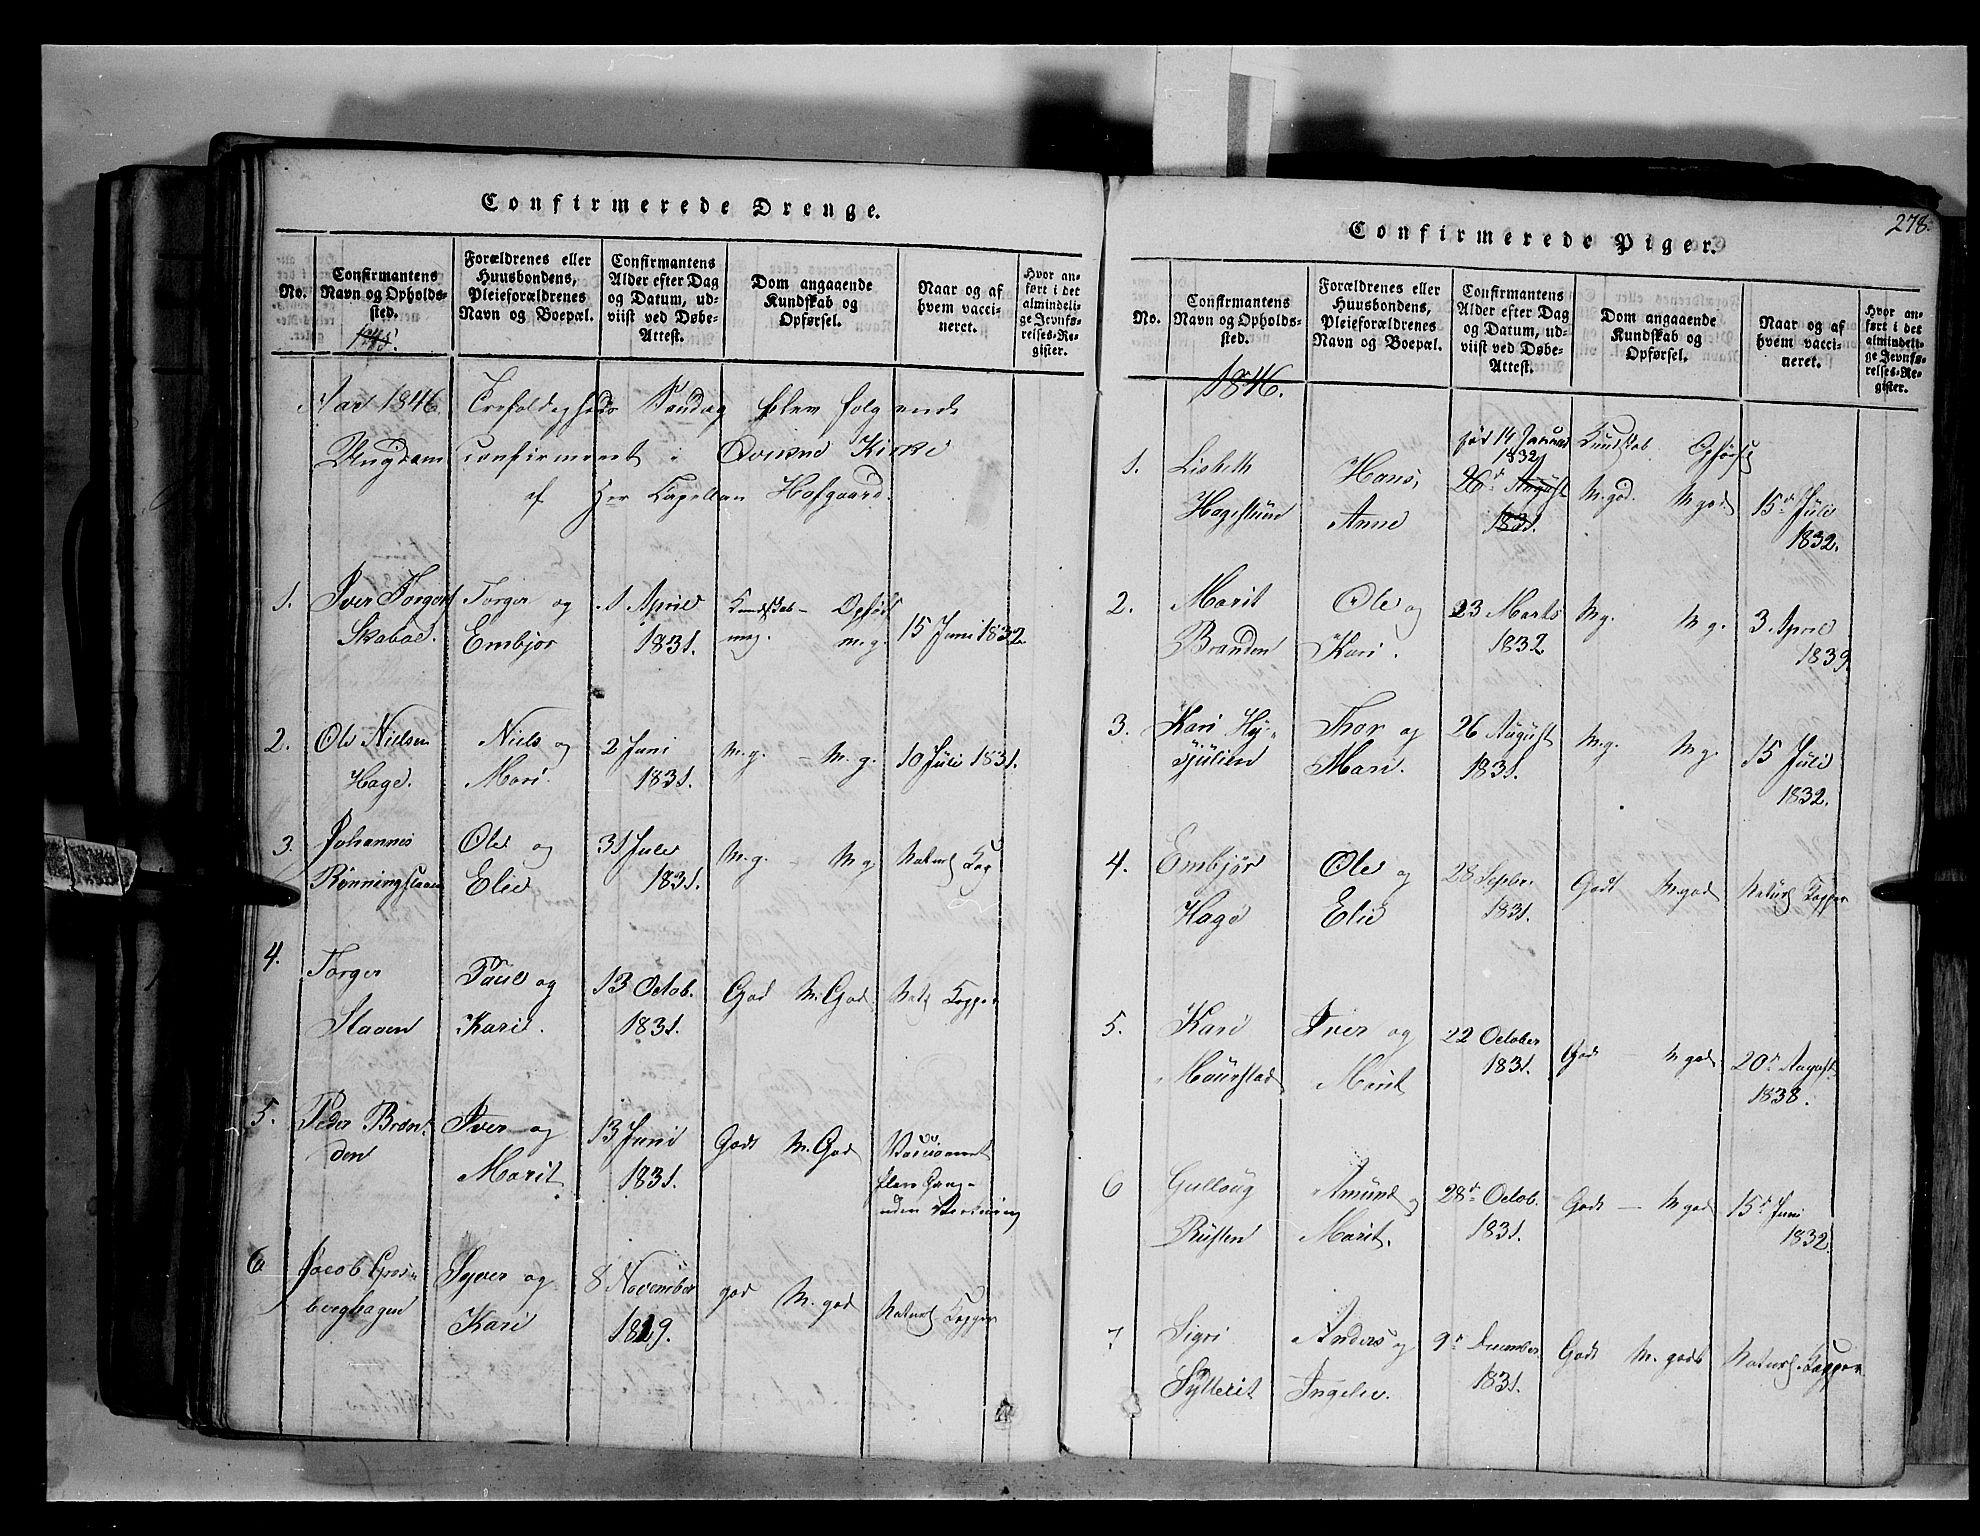 SAH, Fron prestekontor, H/Ha/Hab/L0003: Klokkerbok nr. 3, 1816-1850, s. 278